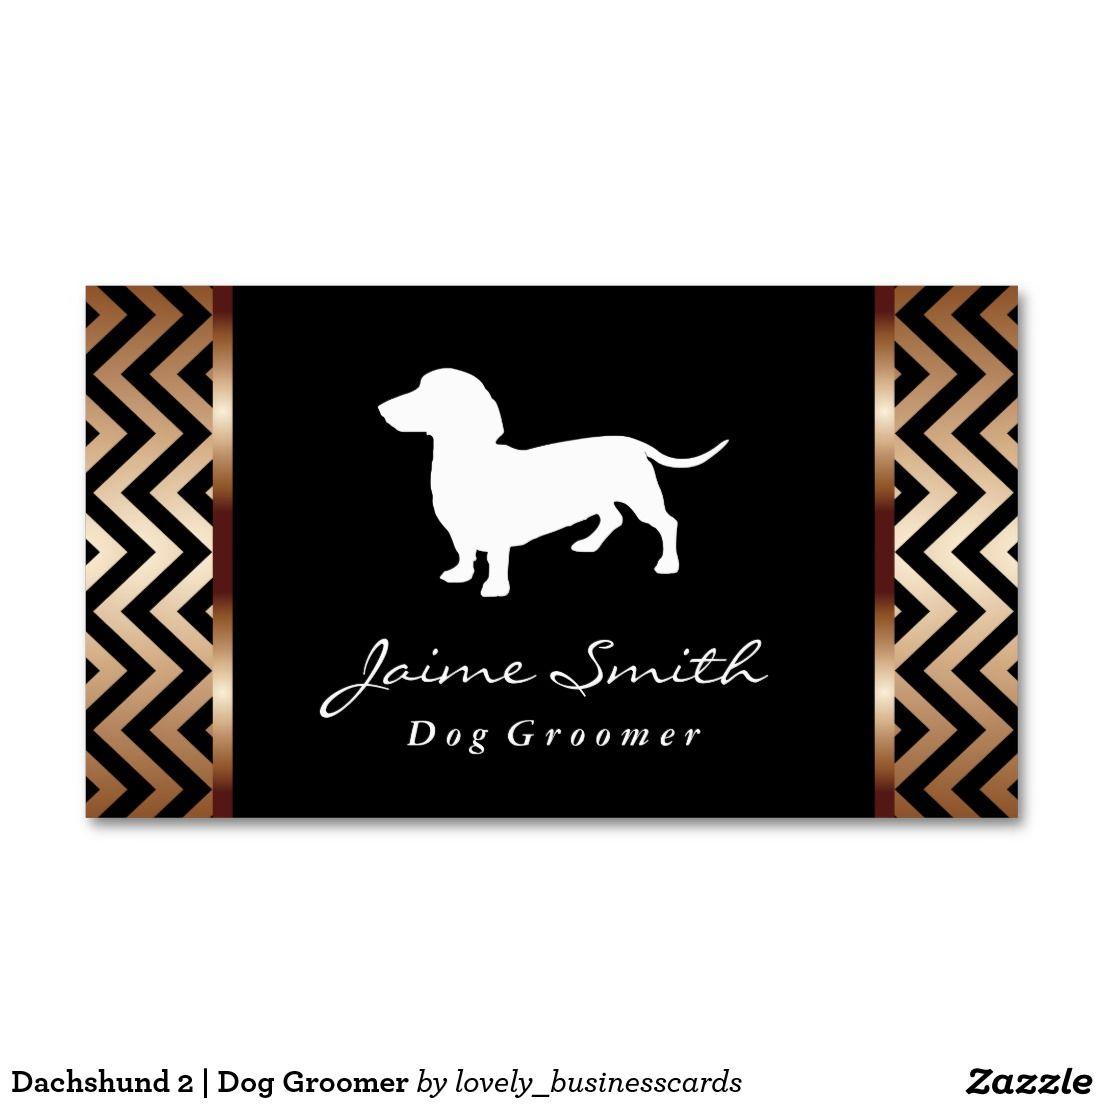 Dachshund 2 | Dog Groomer Business Card | Dachshunds, Business cards ...